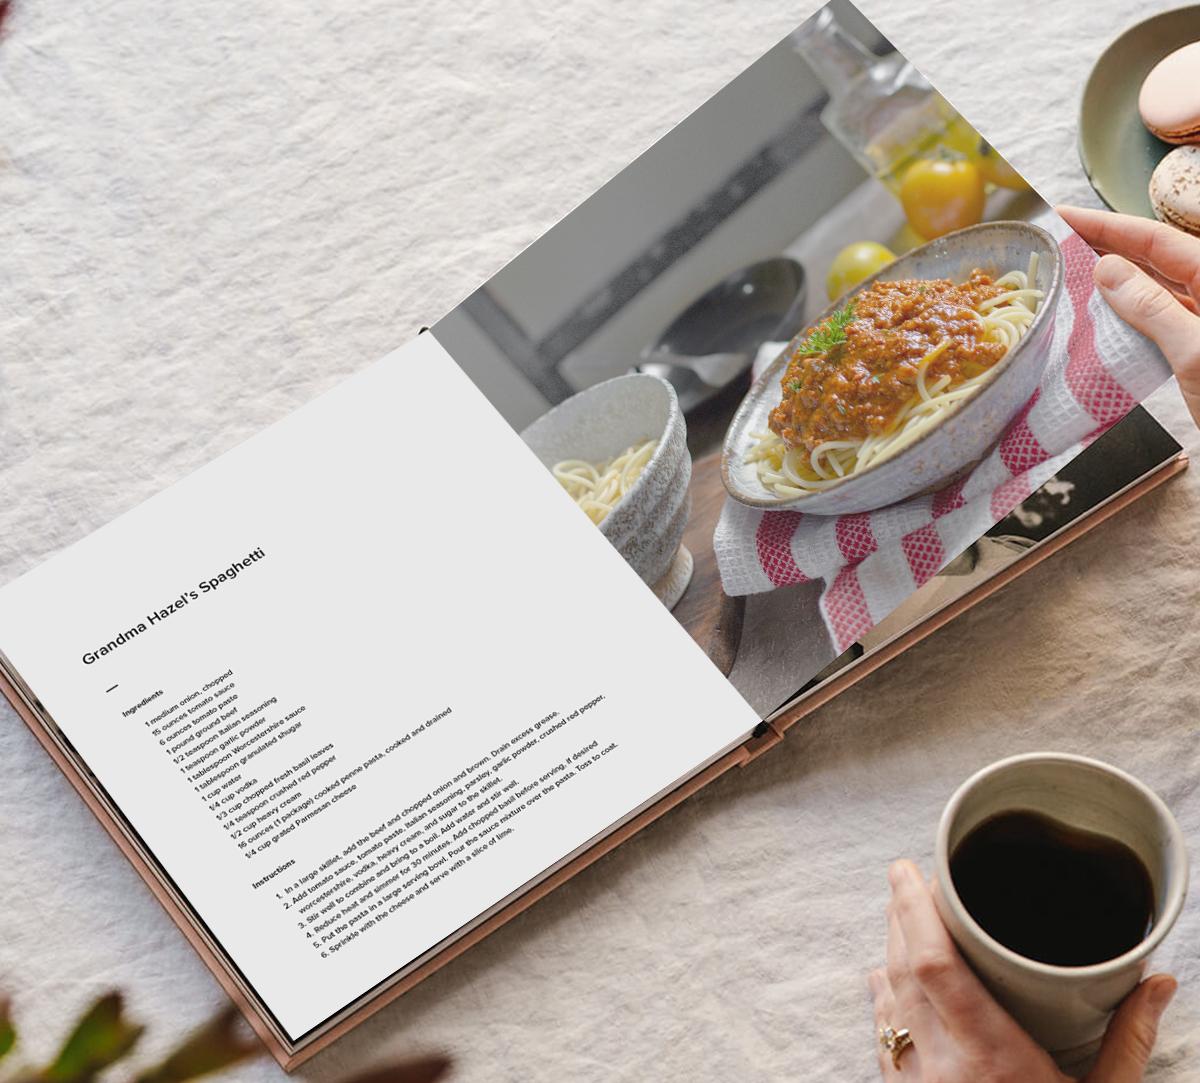 Family spaghetti recipe in Artifact Uprising Layflat Photo Book printed as cookbook